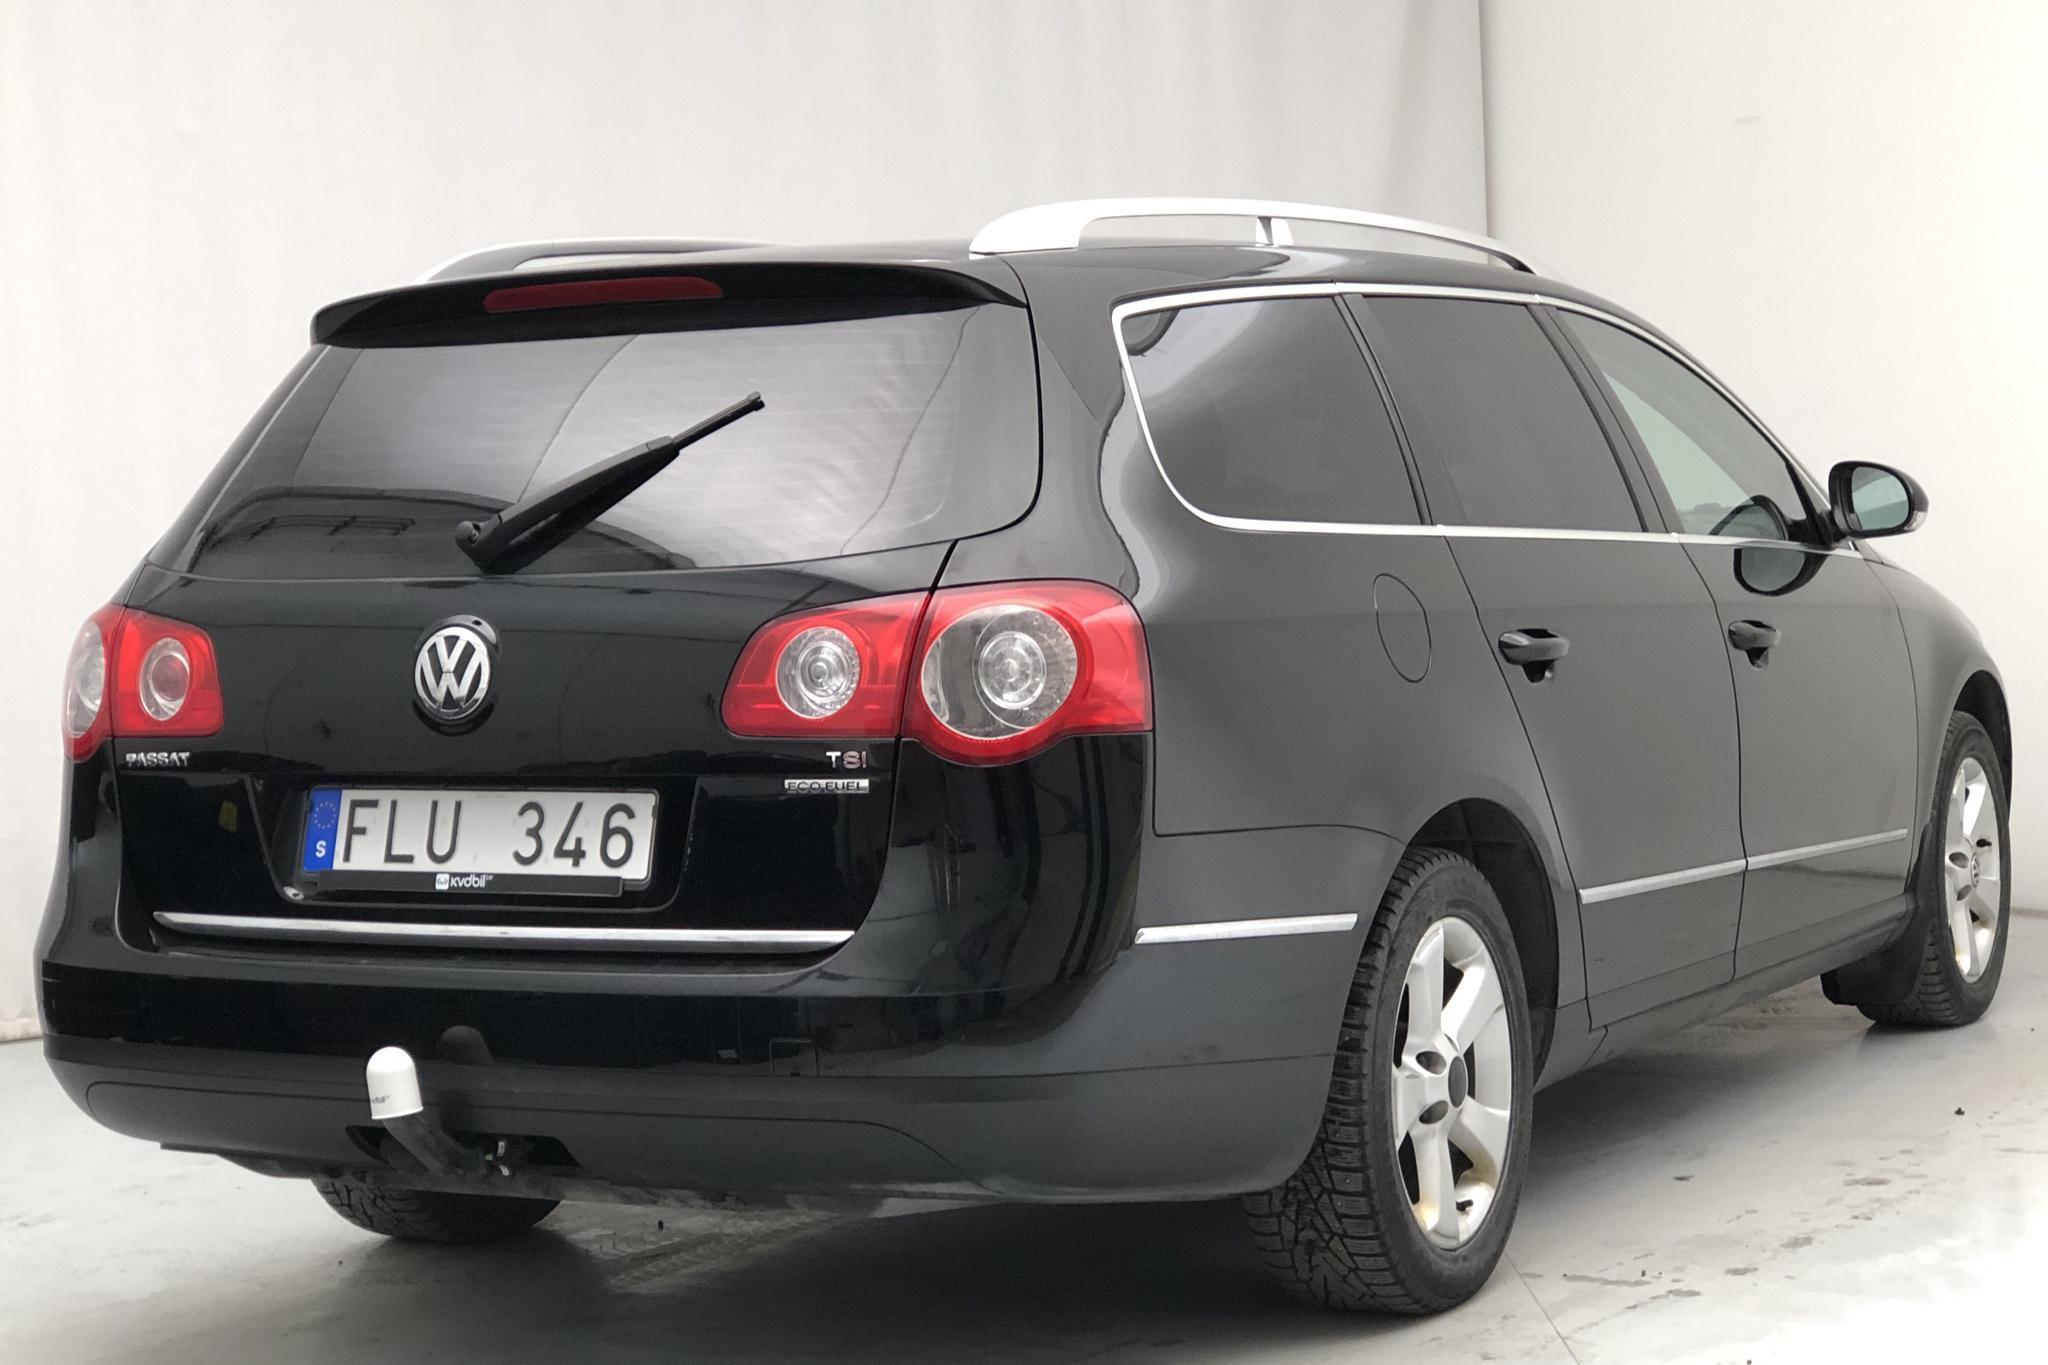 VW Passat 1.4 TSI EcoFuel Variant (150hk) - 18 589 mil - Manuell - svart - 2010